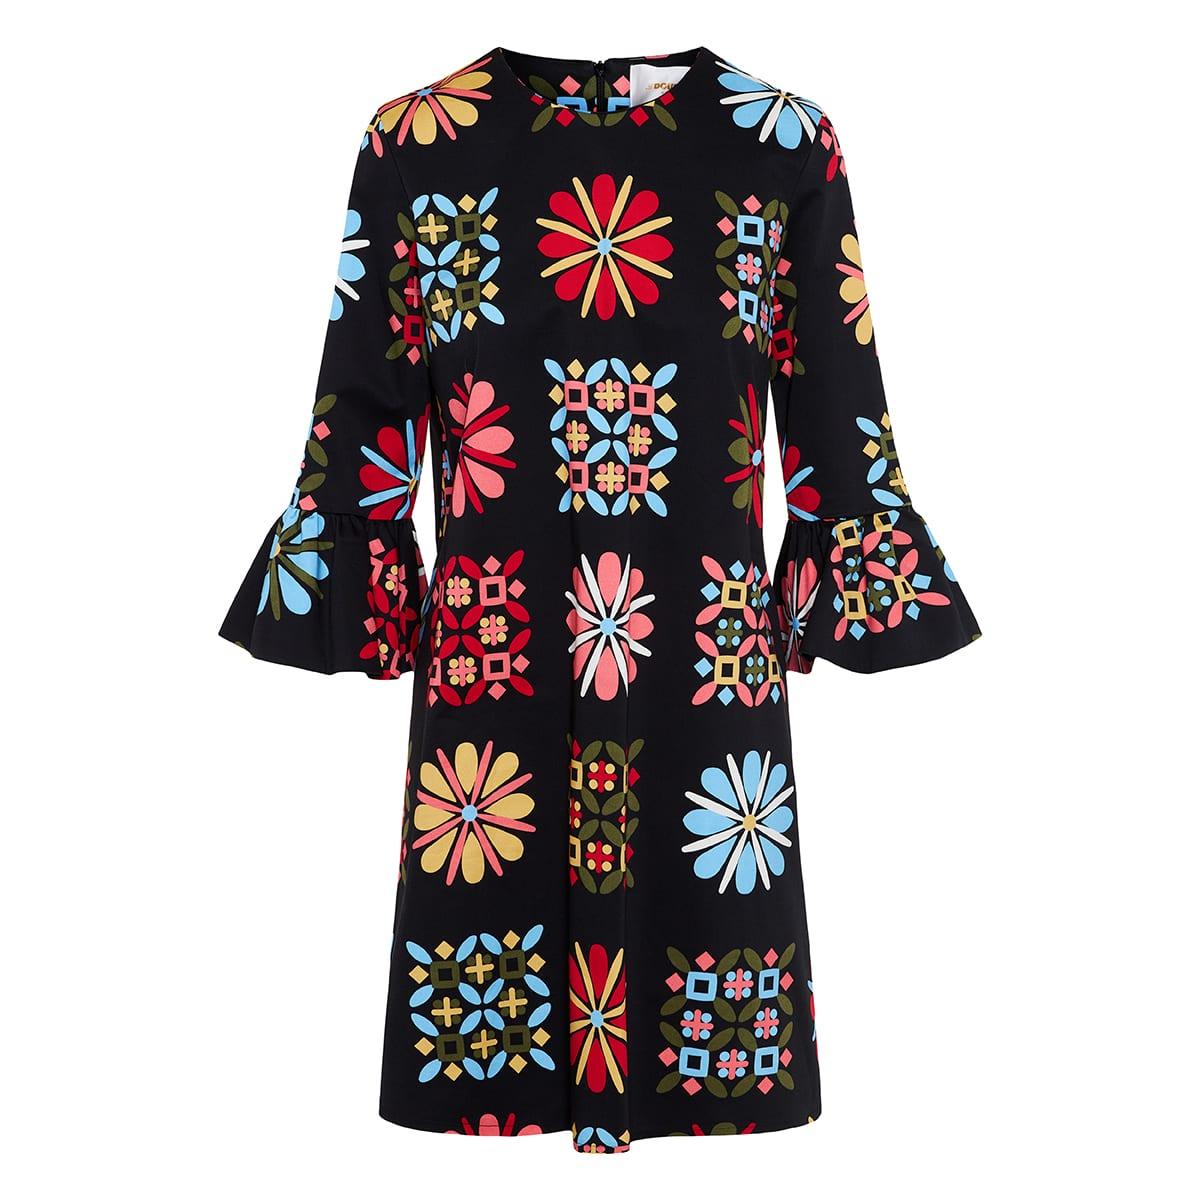 24/7 short printed dress